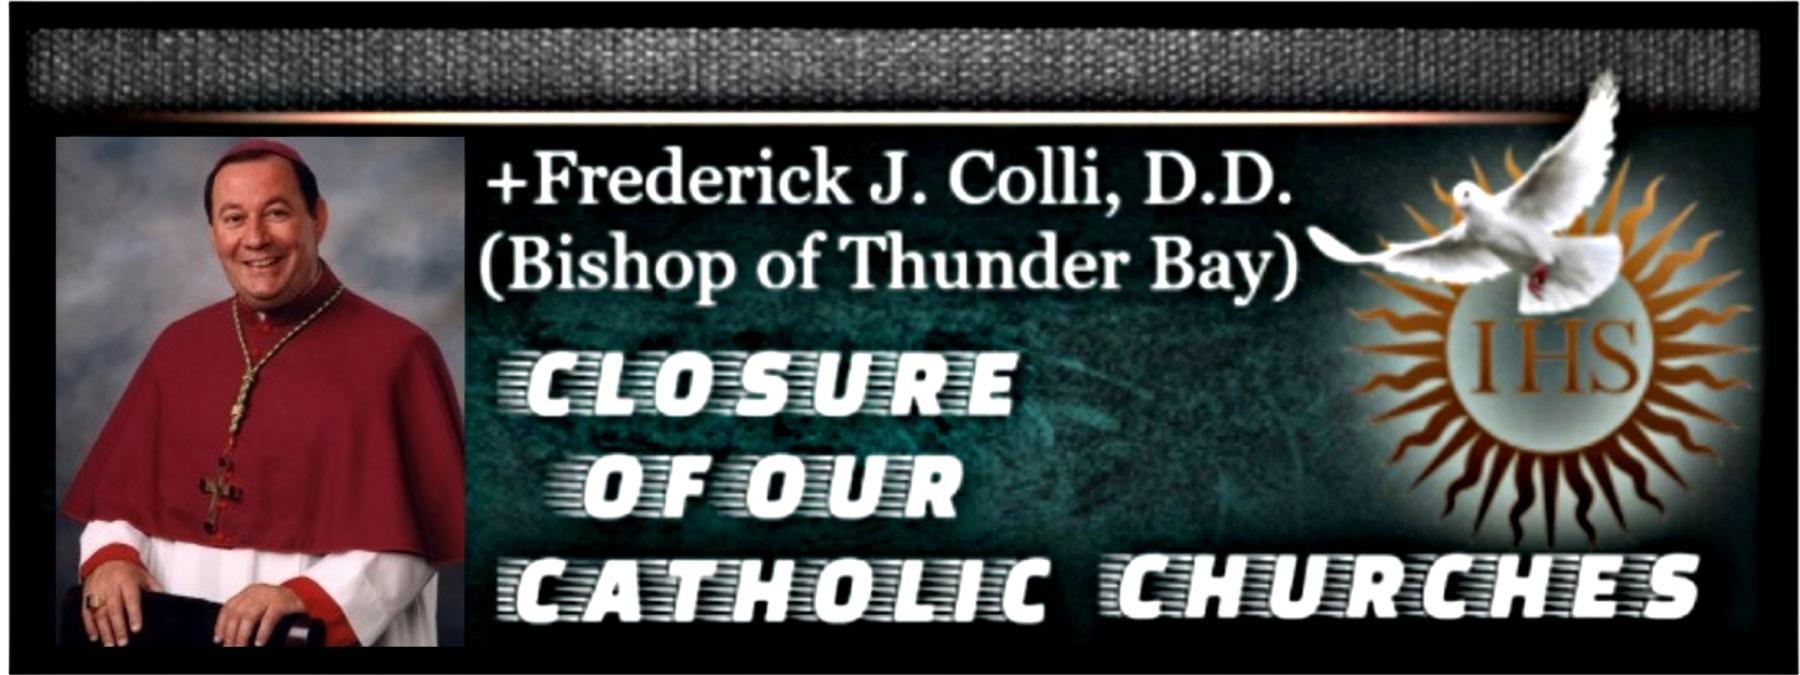 St. Louis - Bishop Colli - 6 by 2.25 April 16, 2021